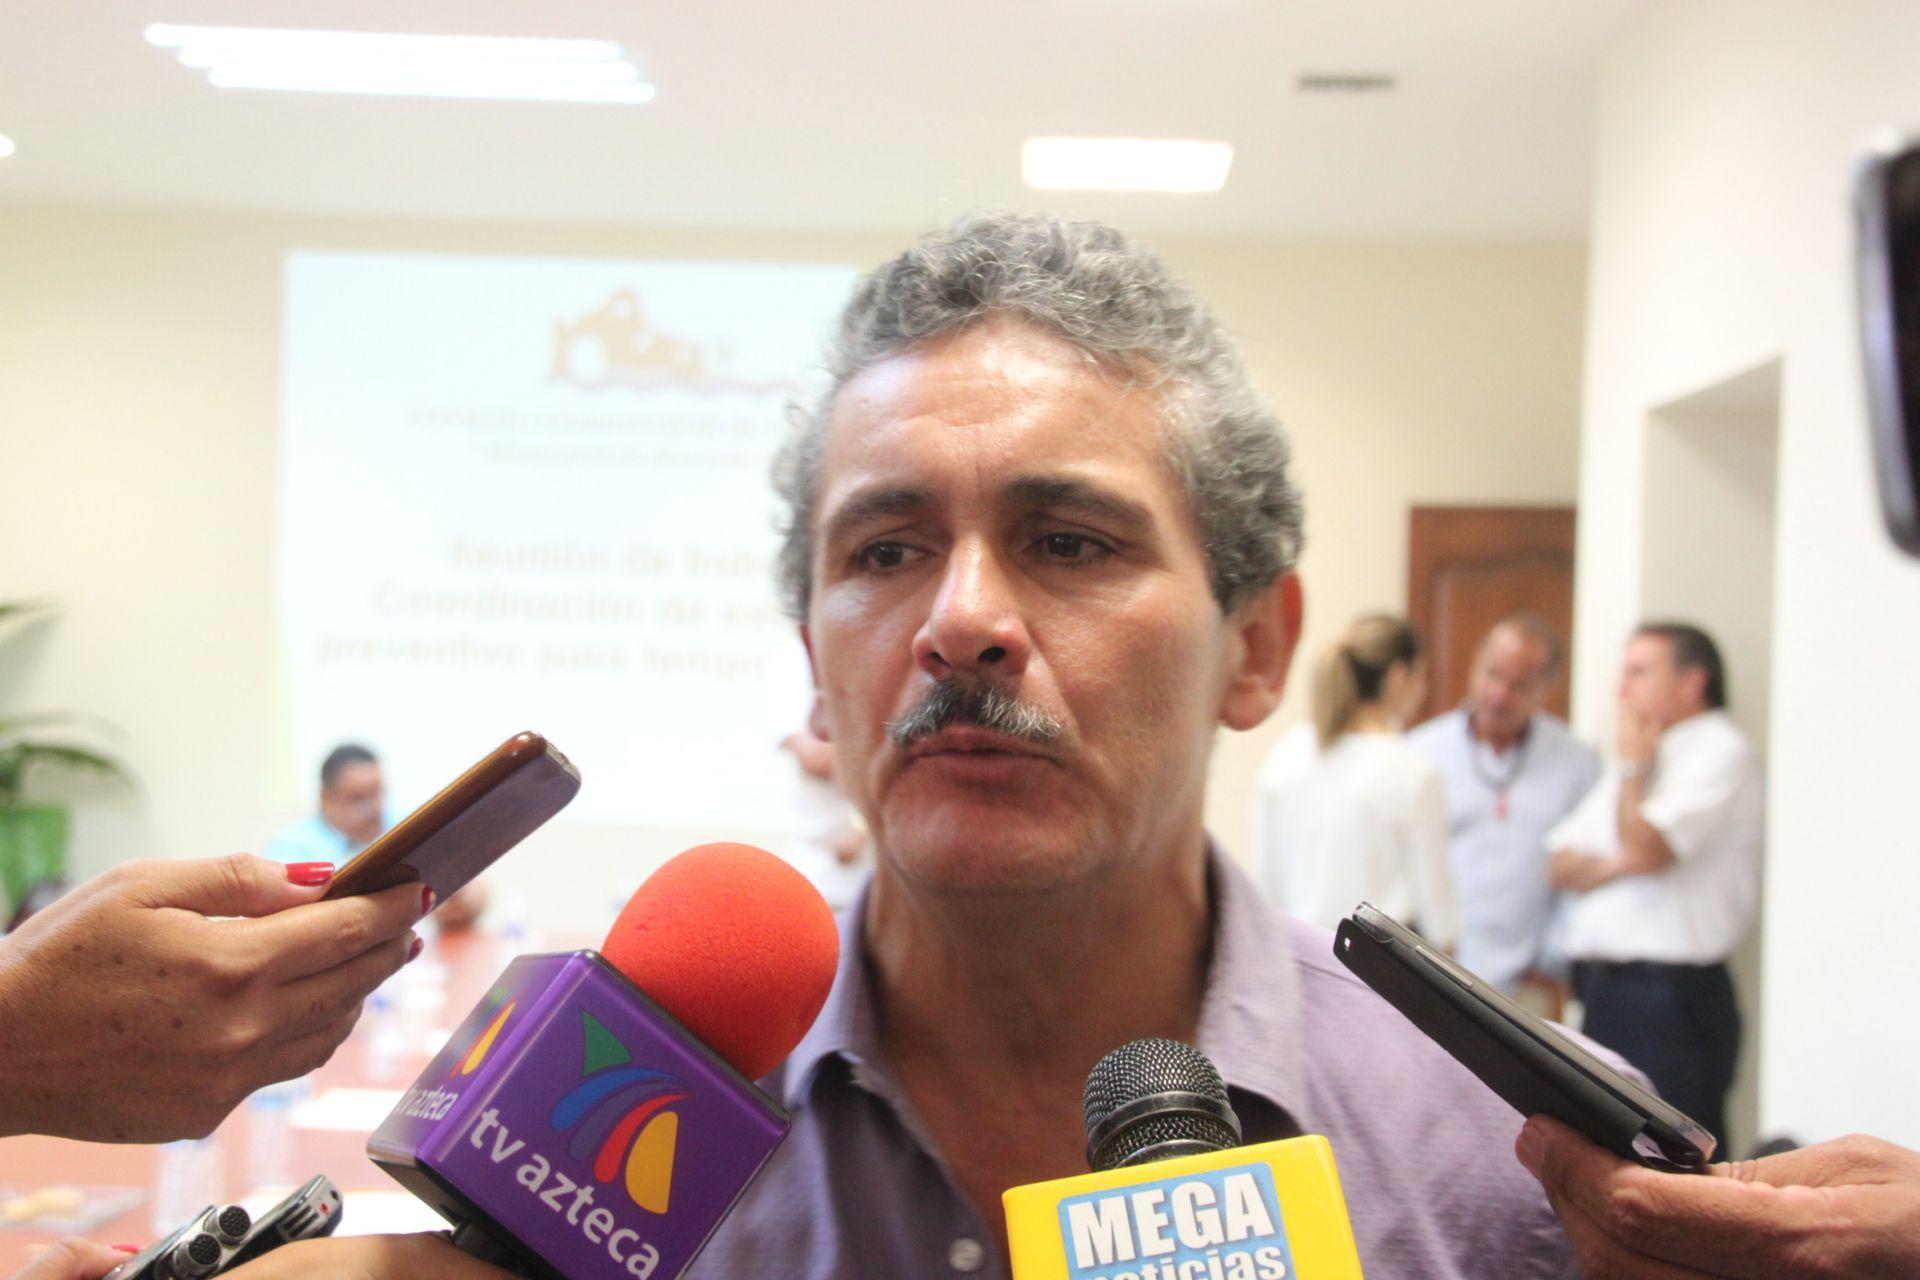 04Serueniránempresariosconlacomisiónreguladoradeenergía-JulioCastillo